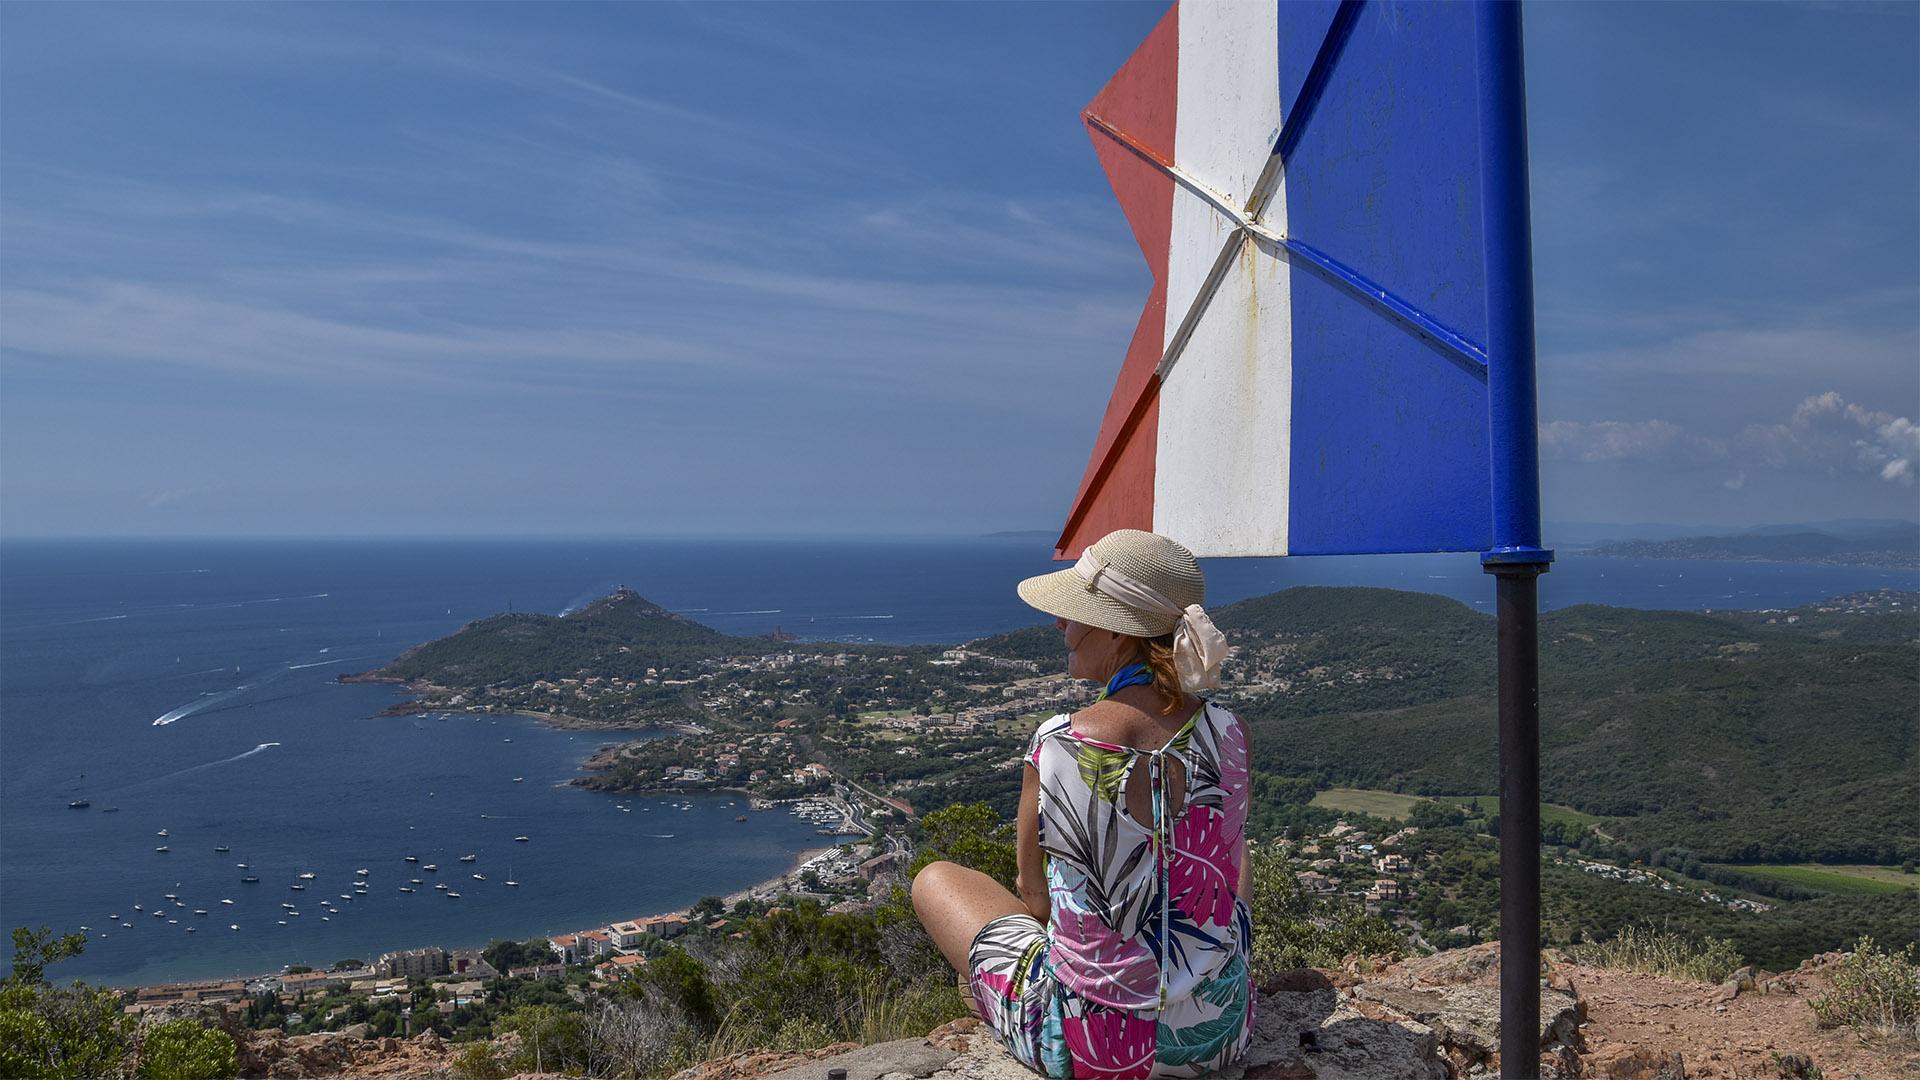 Agay_Mediterranee-drapeau-14juillet-